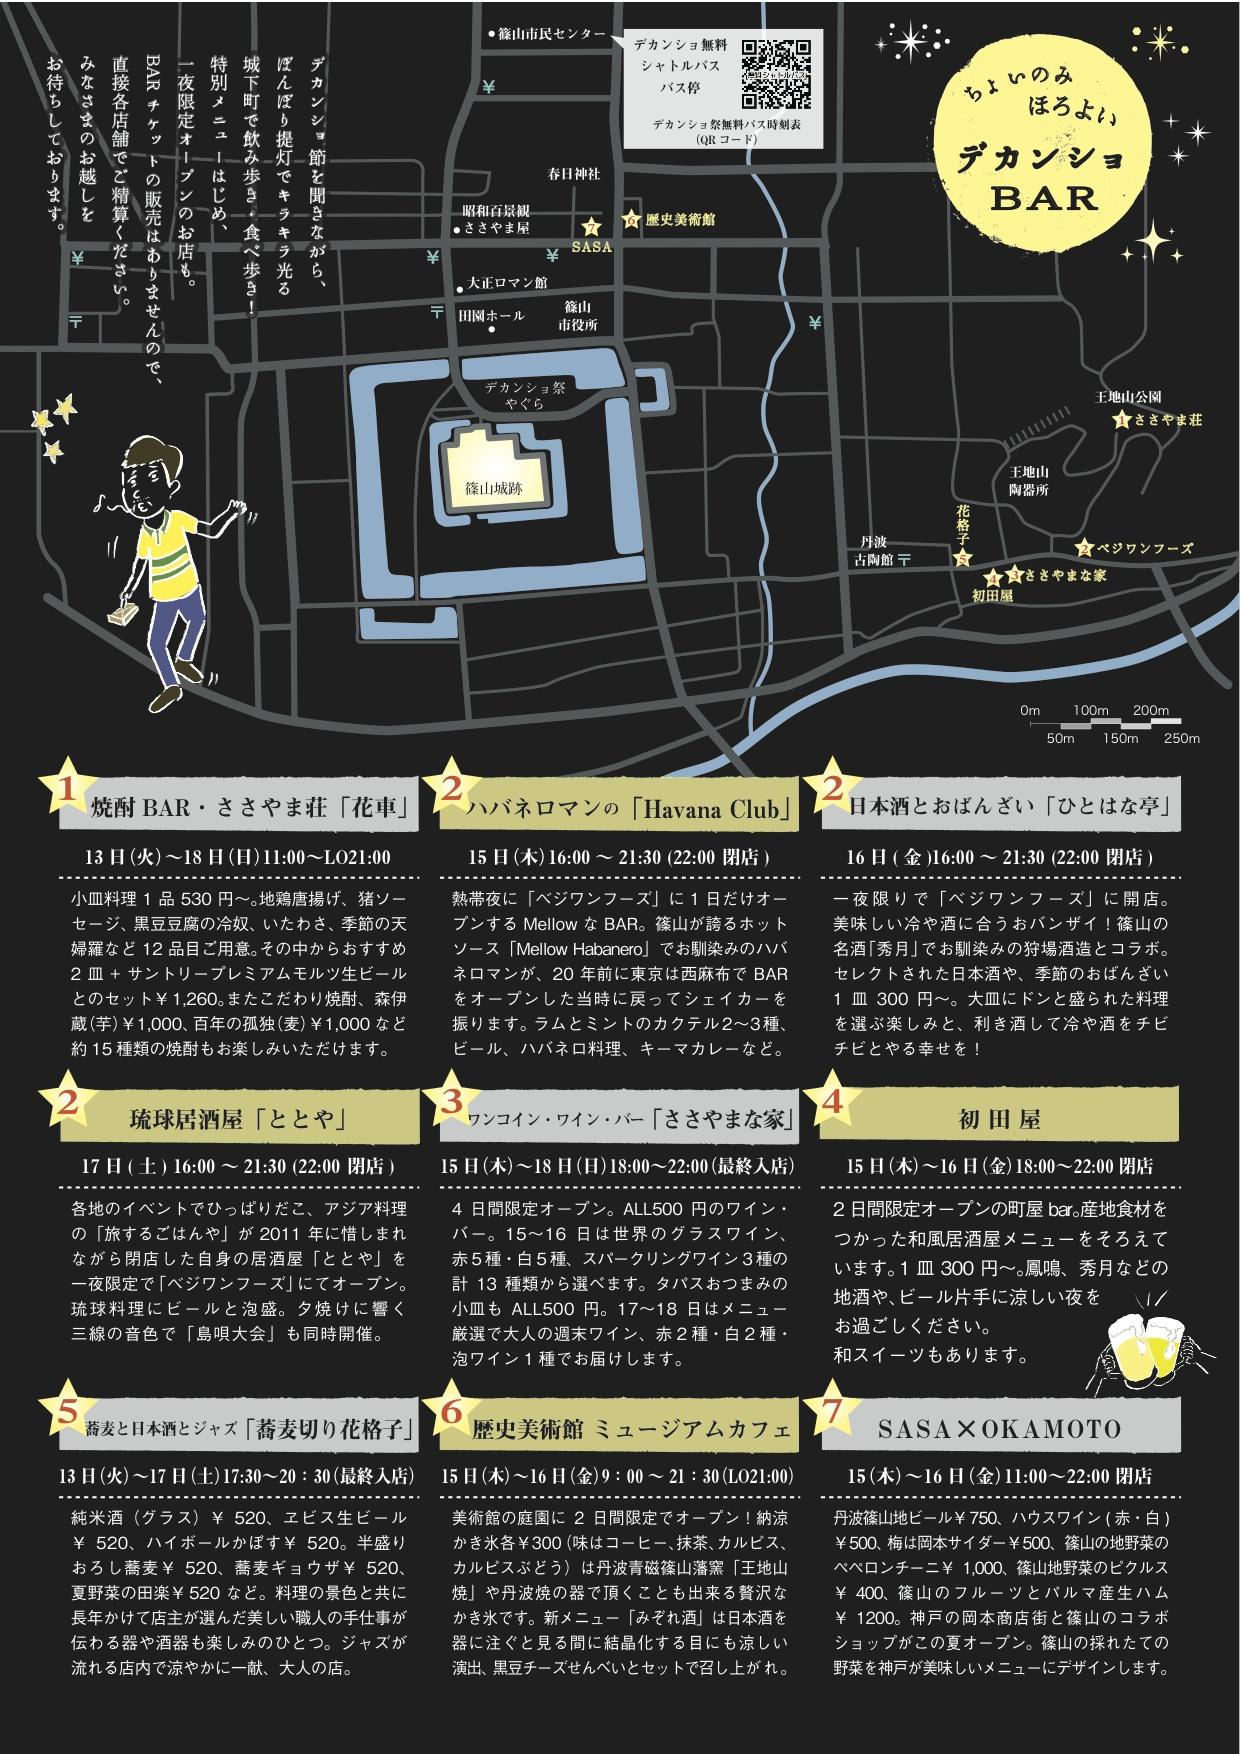 http://rootsy.jp/images/dekansho_BAR_2013-3.jpg